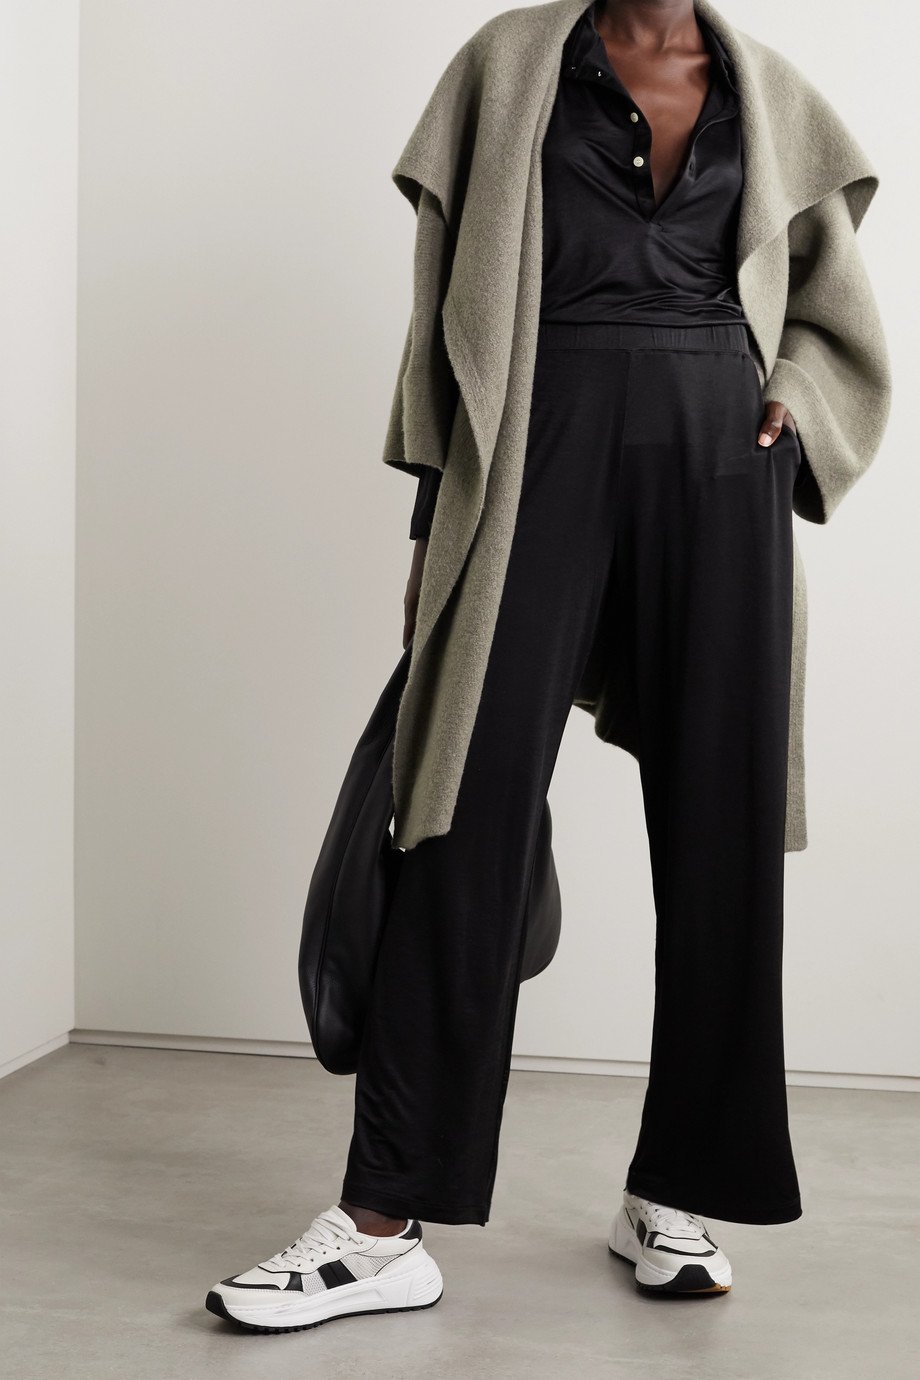 Lauren Manoogian Mantel aus einer Kaschmirmischung